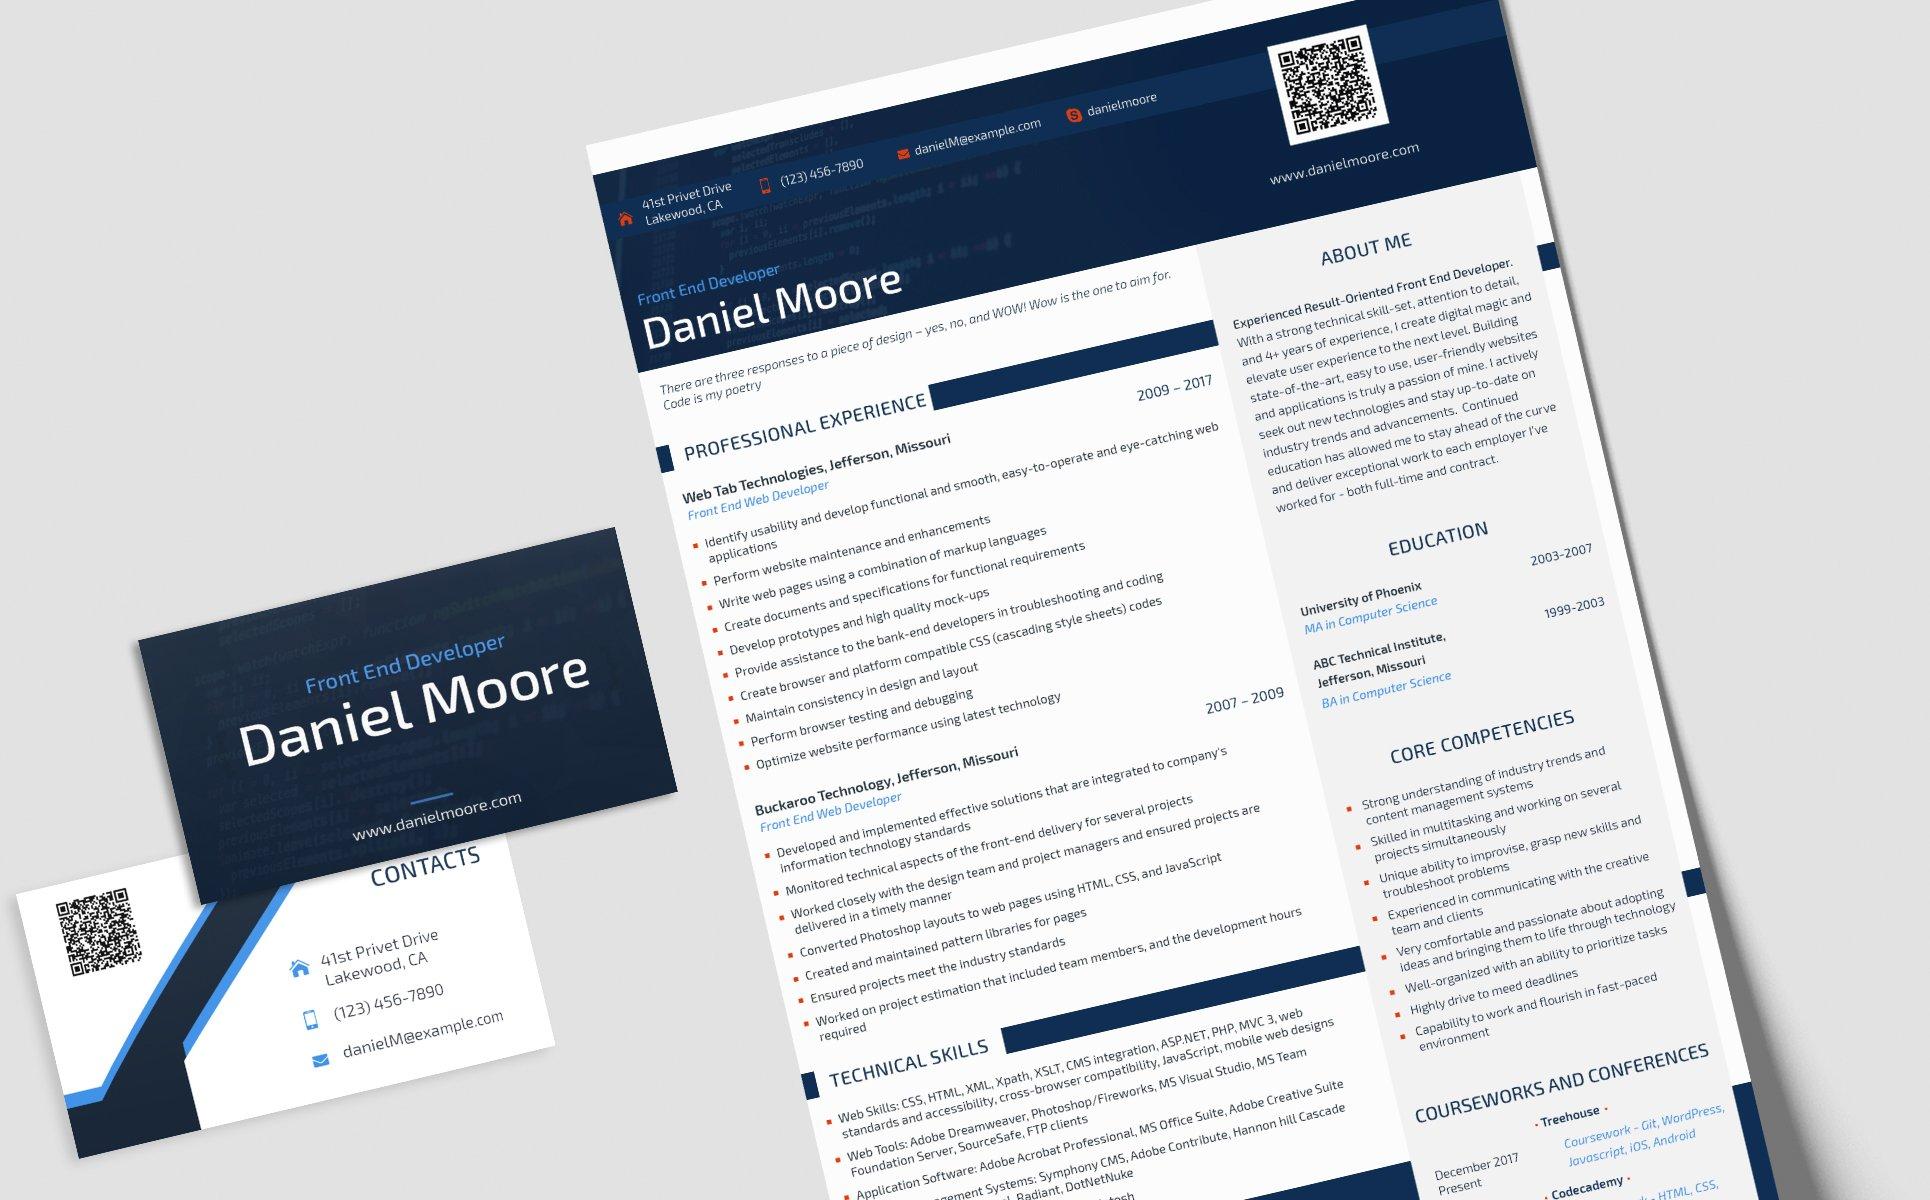 daniel moore front end developer resume template 65245